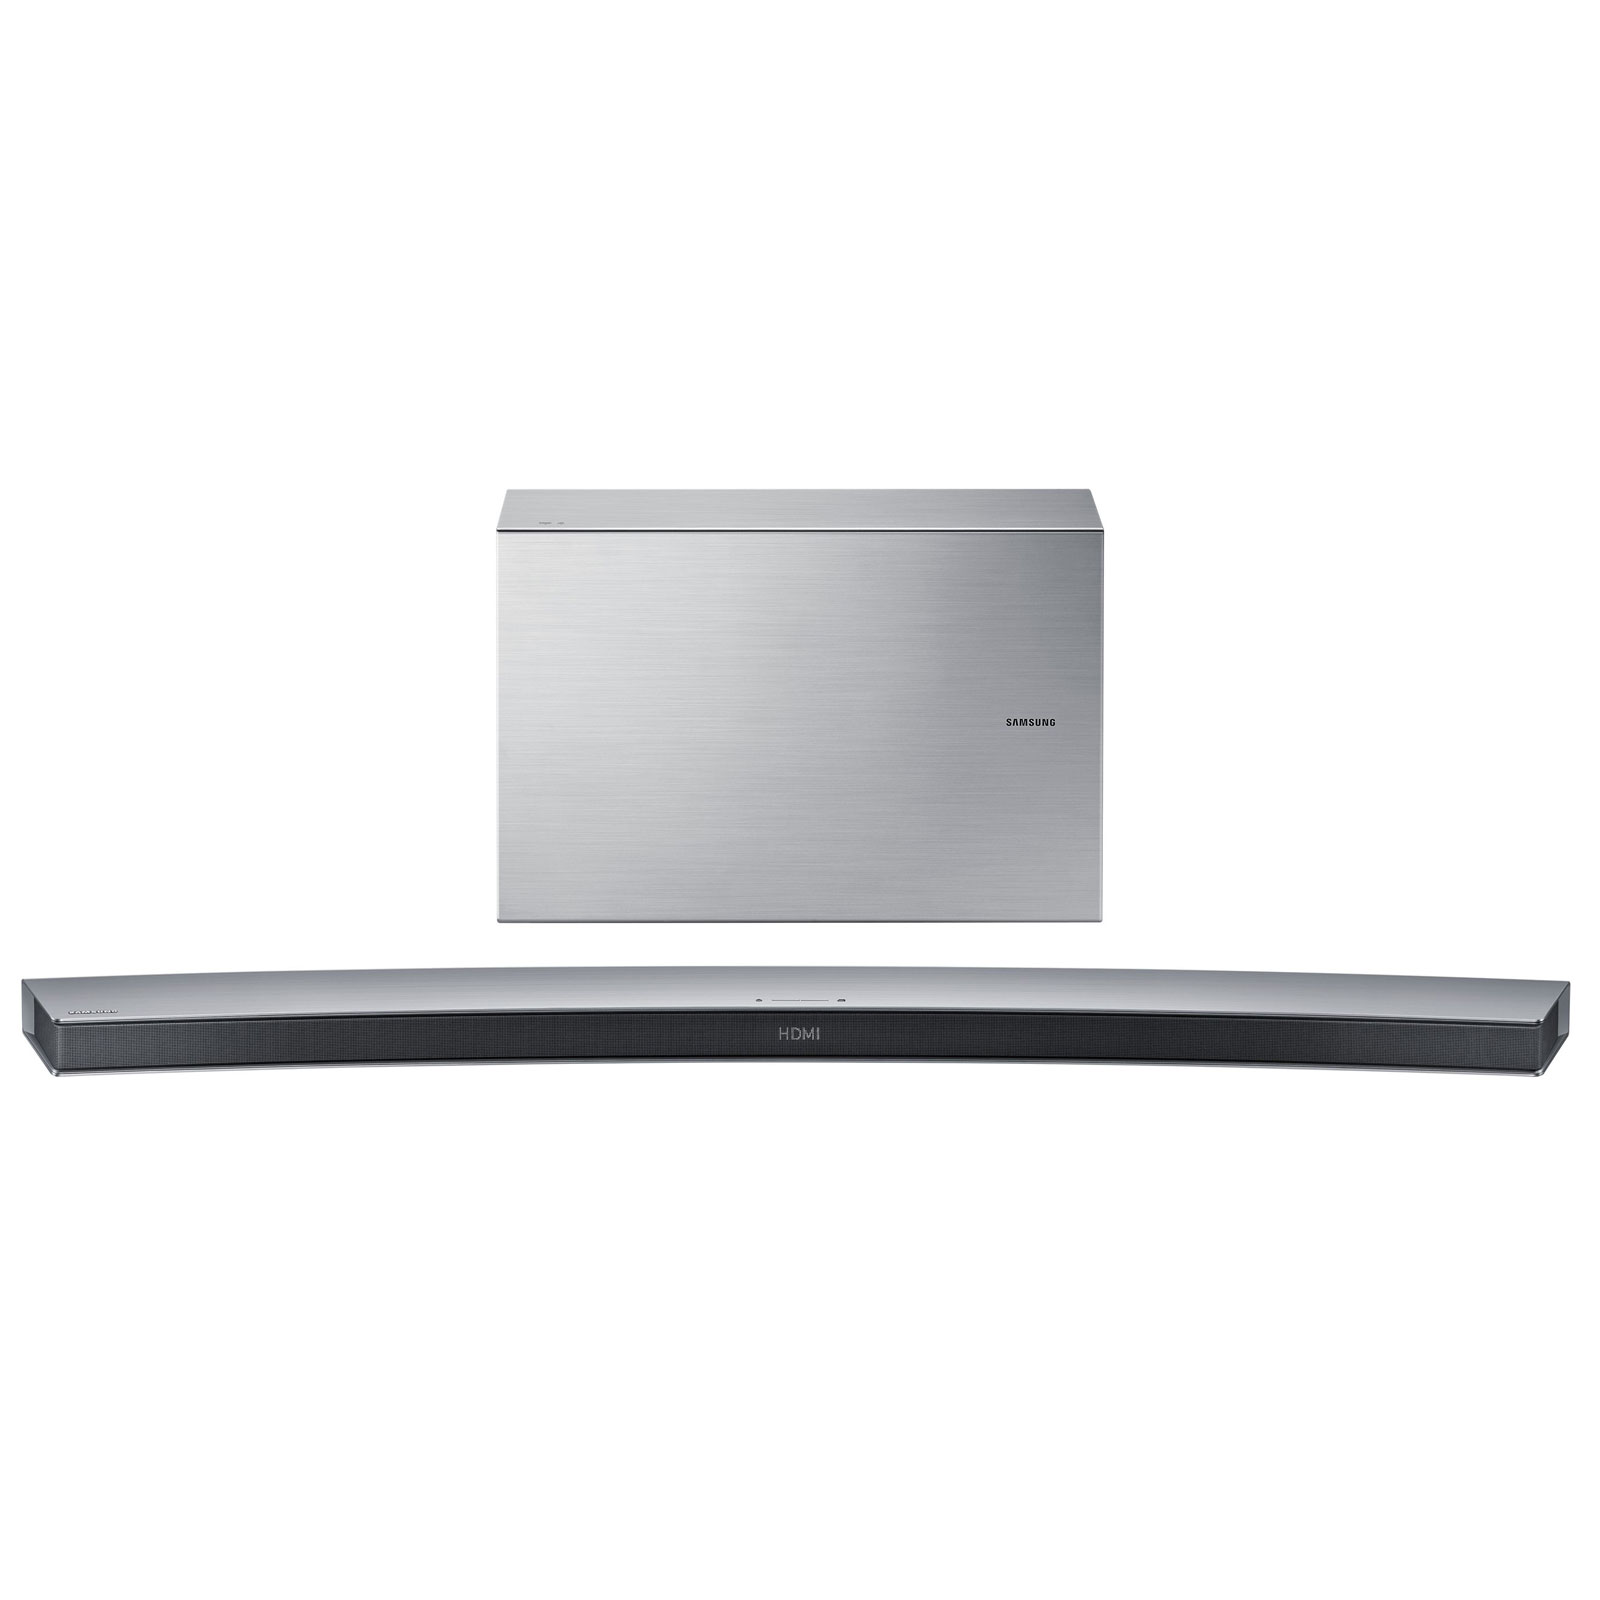 Samsung hw j7501 hwj7501 achat vente barre de son - Meuble tv samsung avec accroche barre de son ...